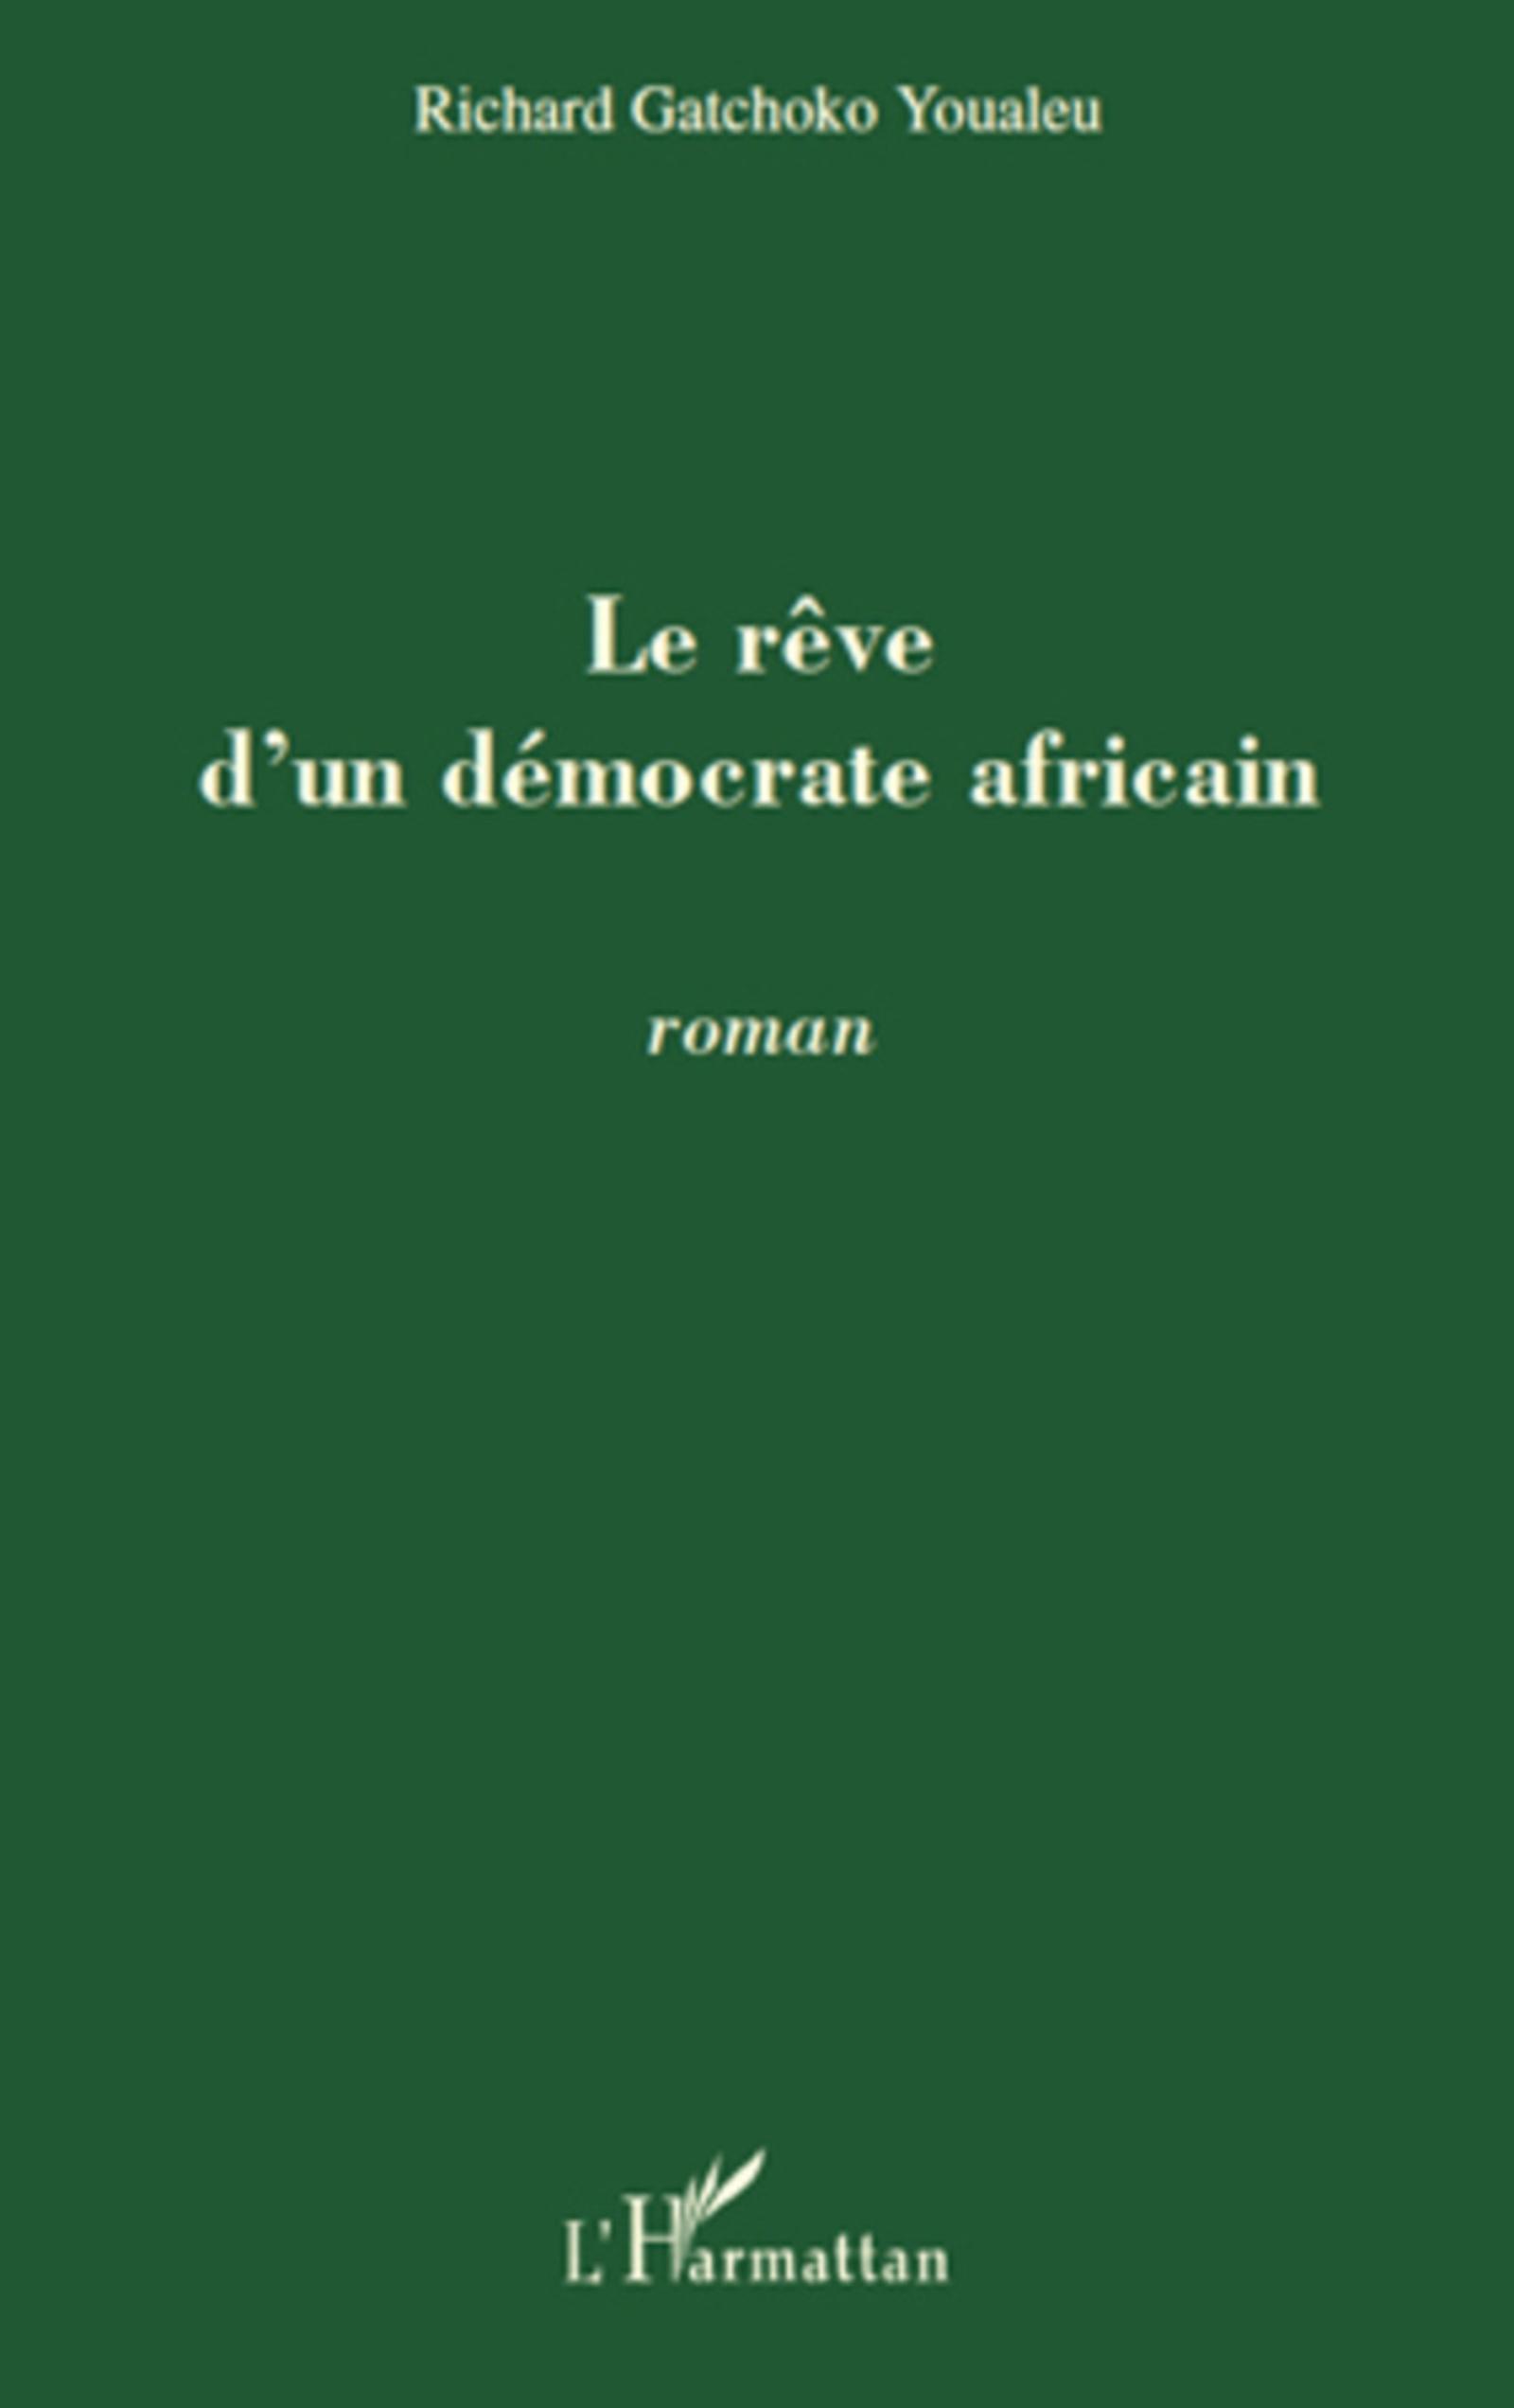 http://www.harmattan.fr/catalogue/couv/9782296082458r.jpg